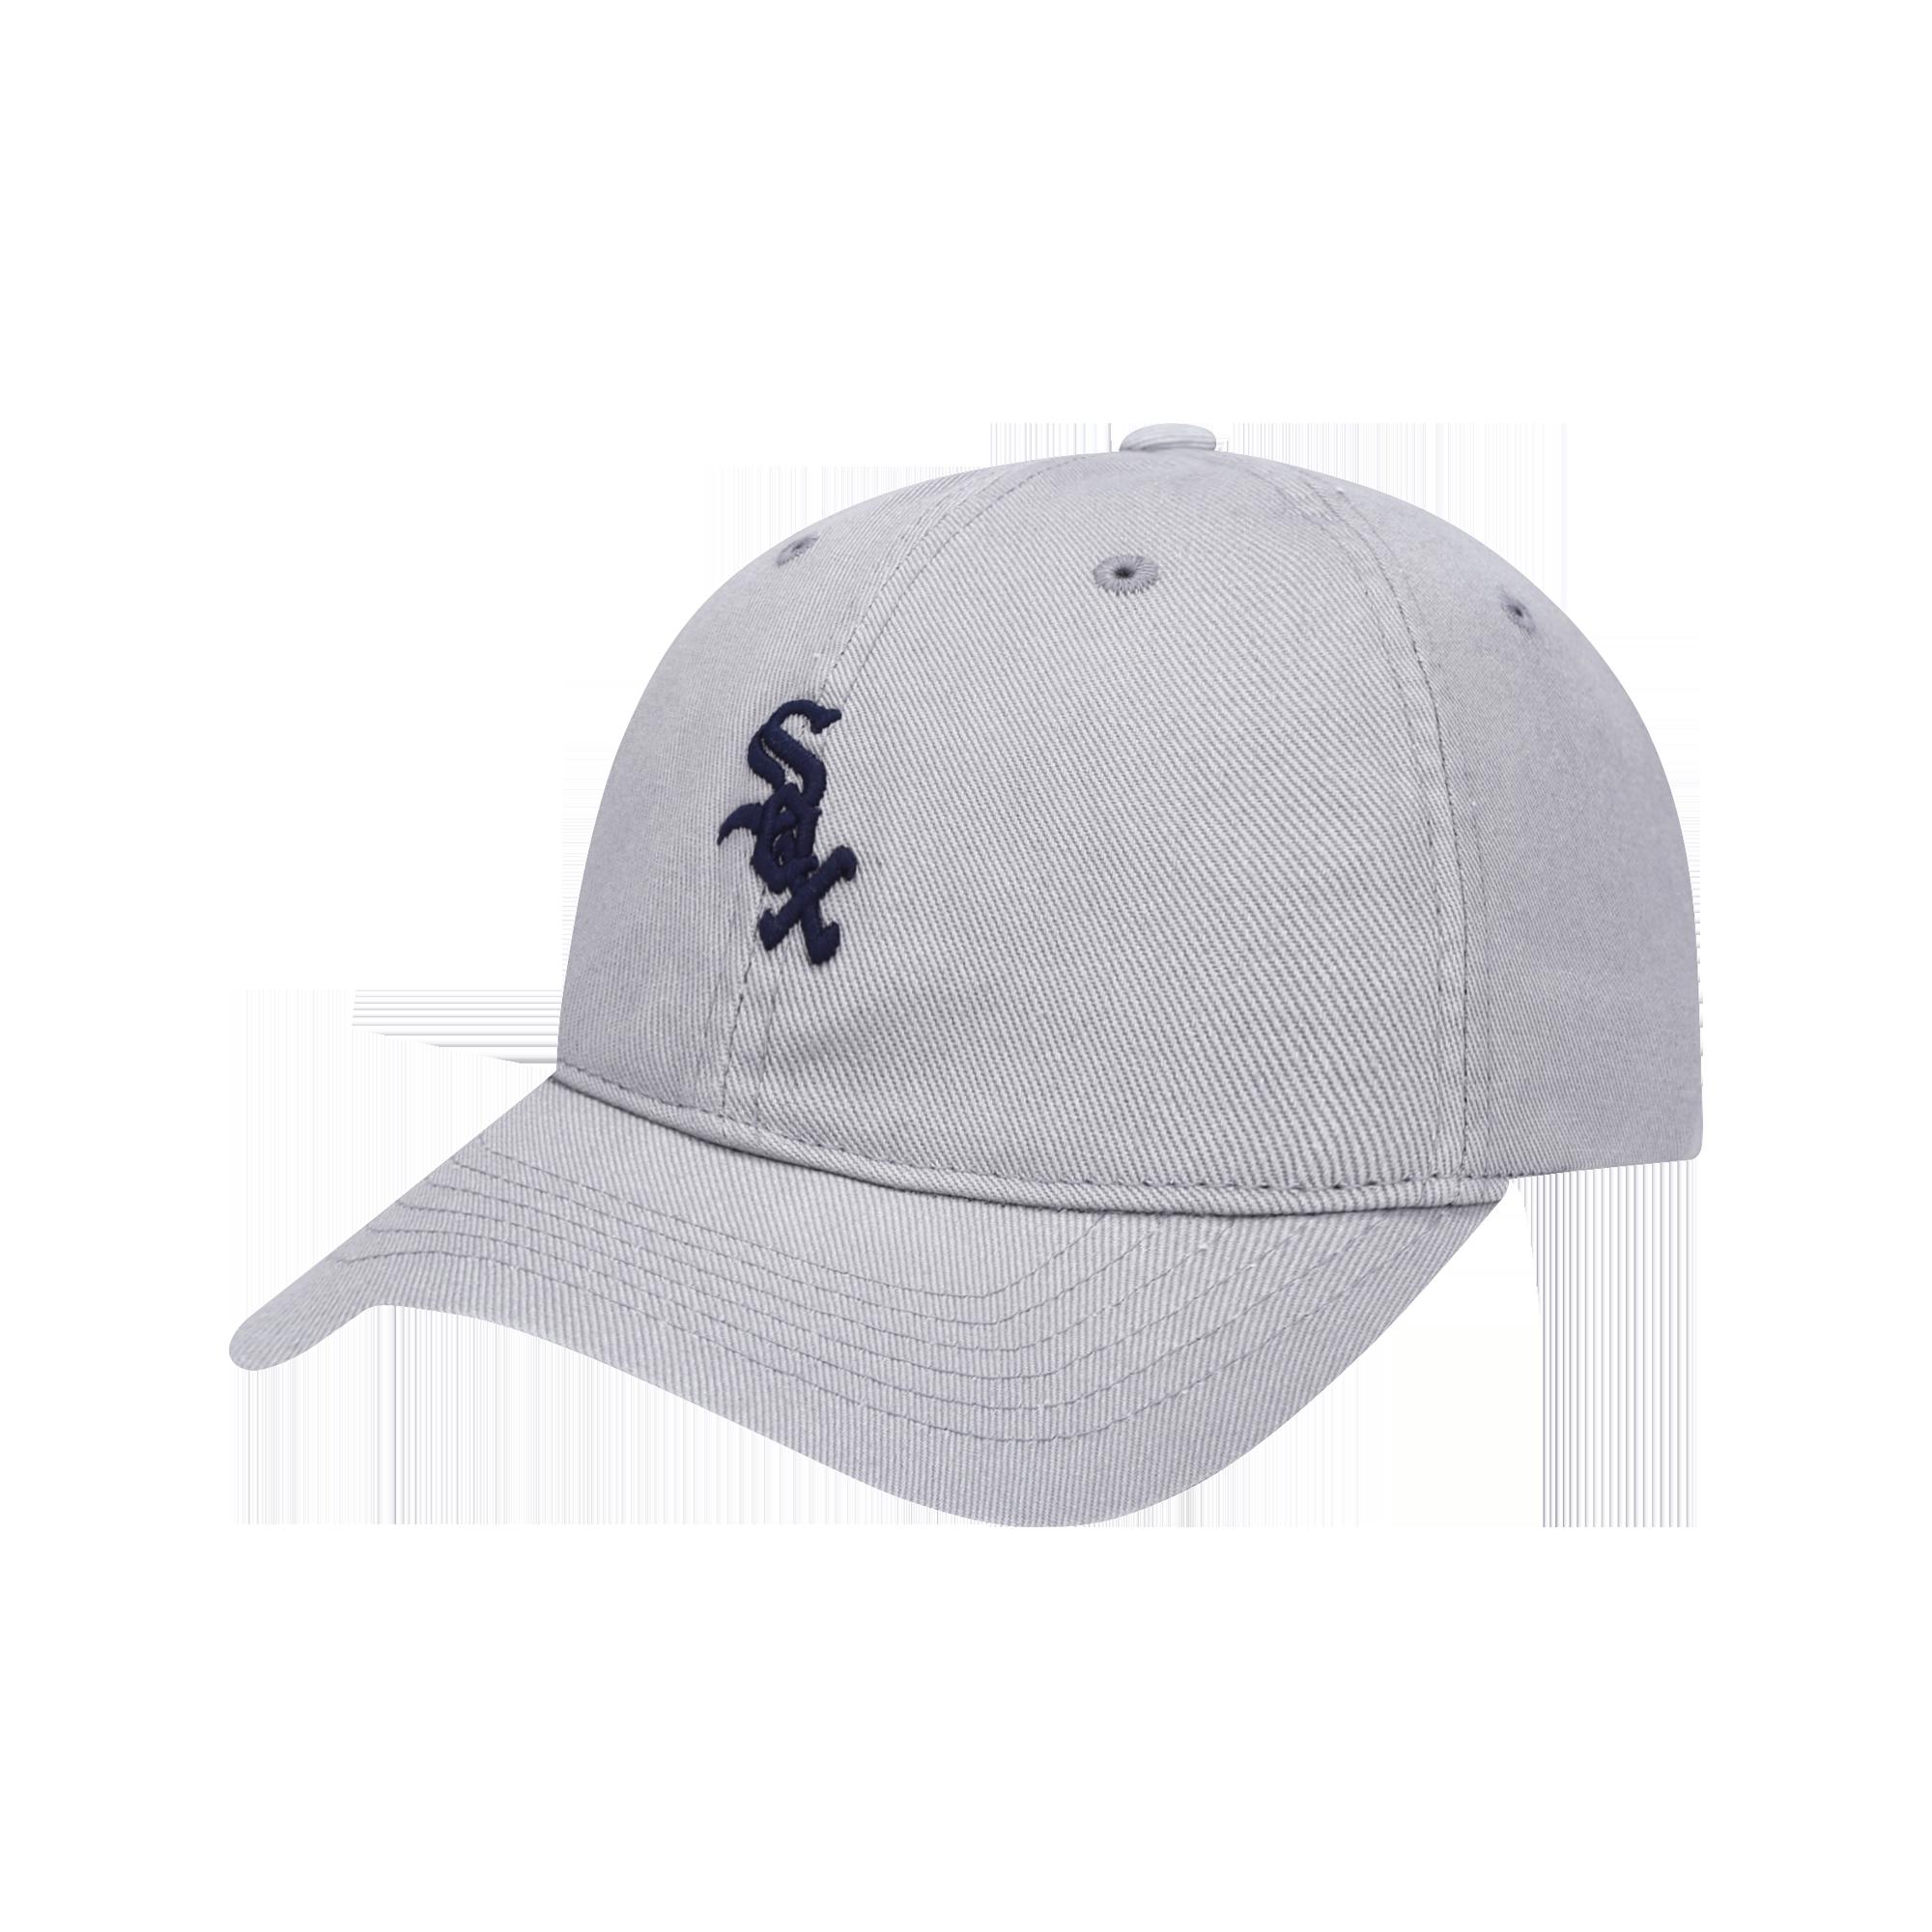 CHICAGO WHITE SOX SLUGGER BALL CAP